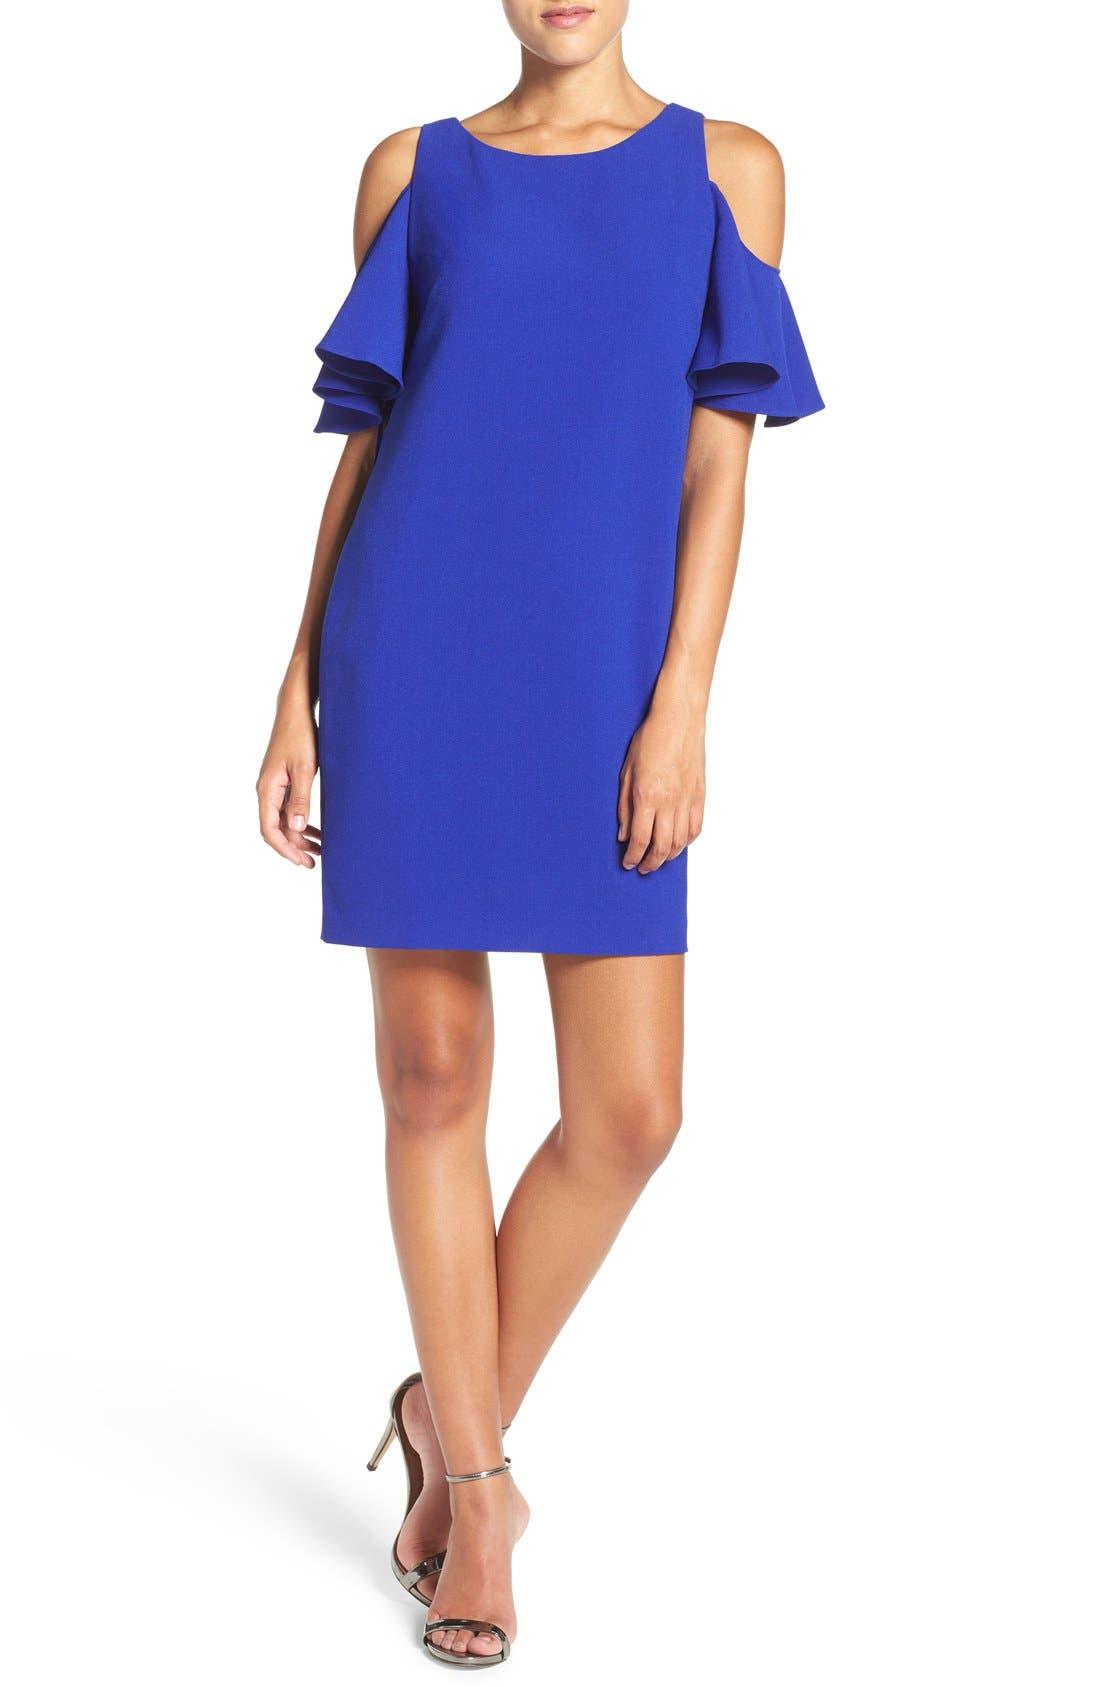 Alternate Image 1 Selected - Chelsea28 'Peek-A-Boo' Cold Shoulder Shift Dress